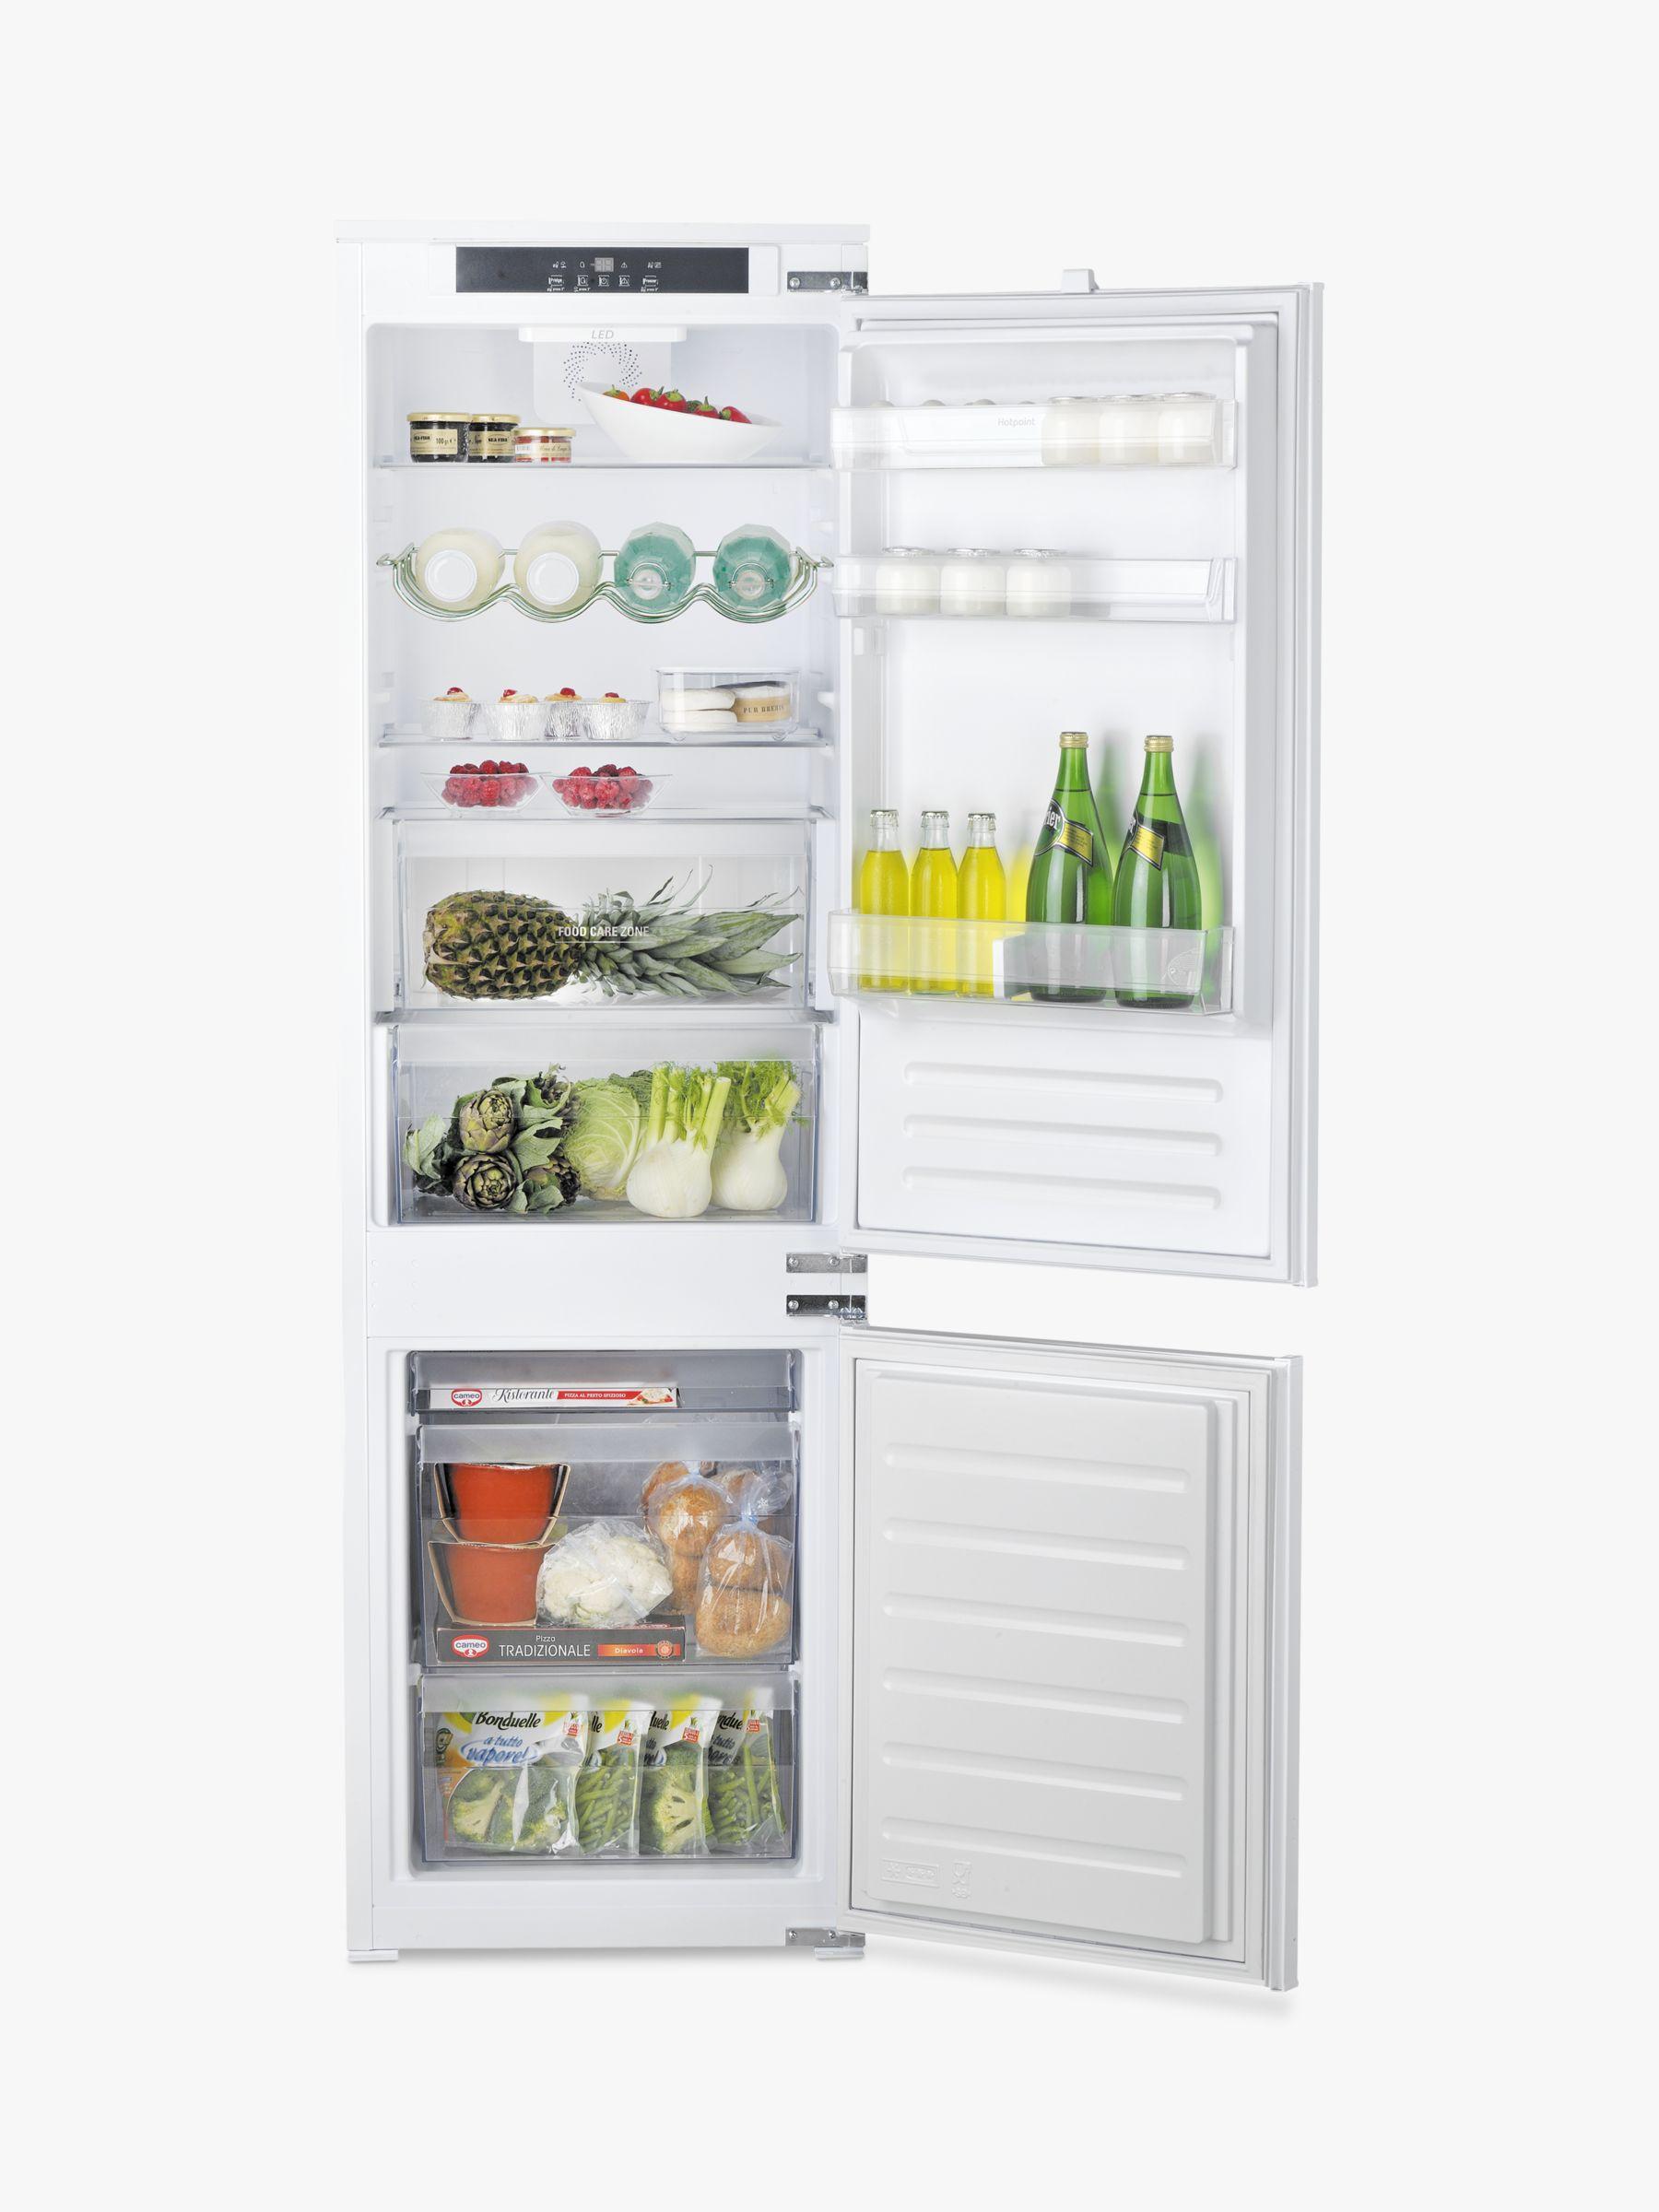 Hotpoint Hotpoint 7030ECAAO3 Integrated Fridge Freezer, A+ Energy Rating, 54cm Wide, White